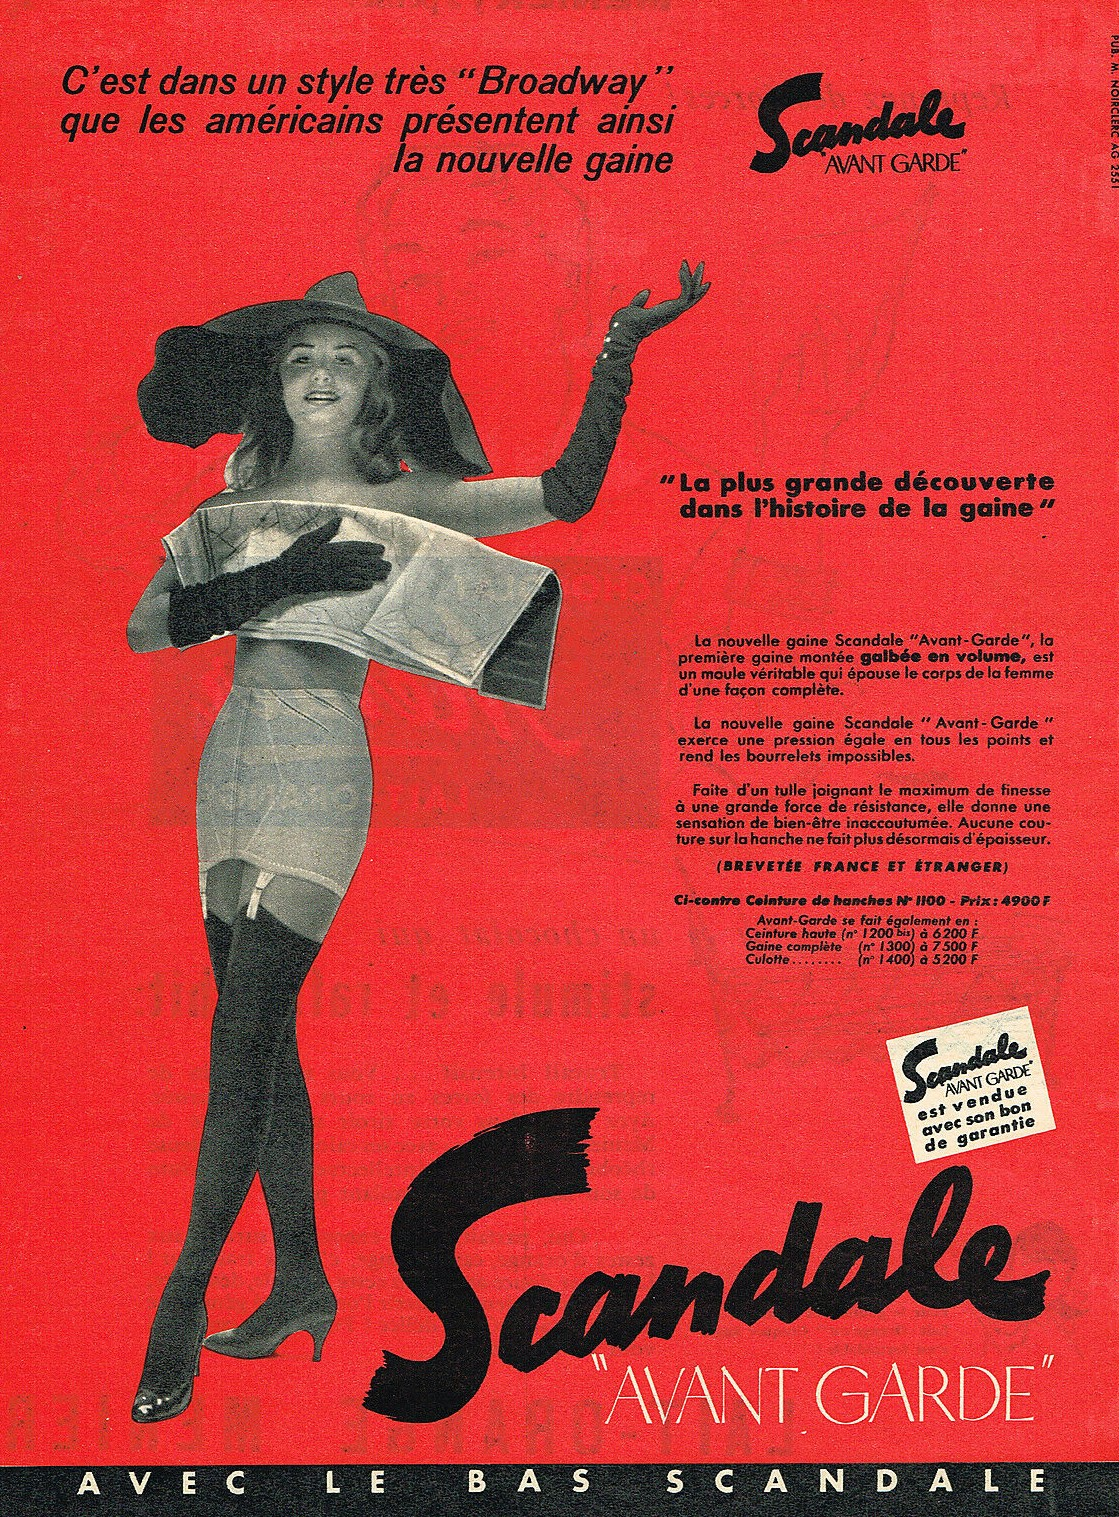 SCANDALE 1955 gaine avant garde